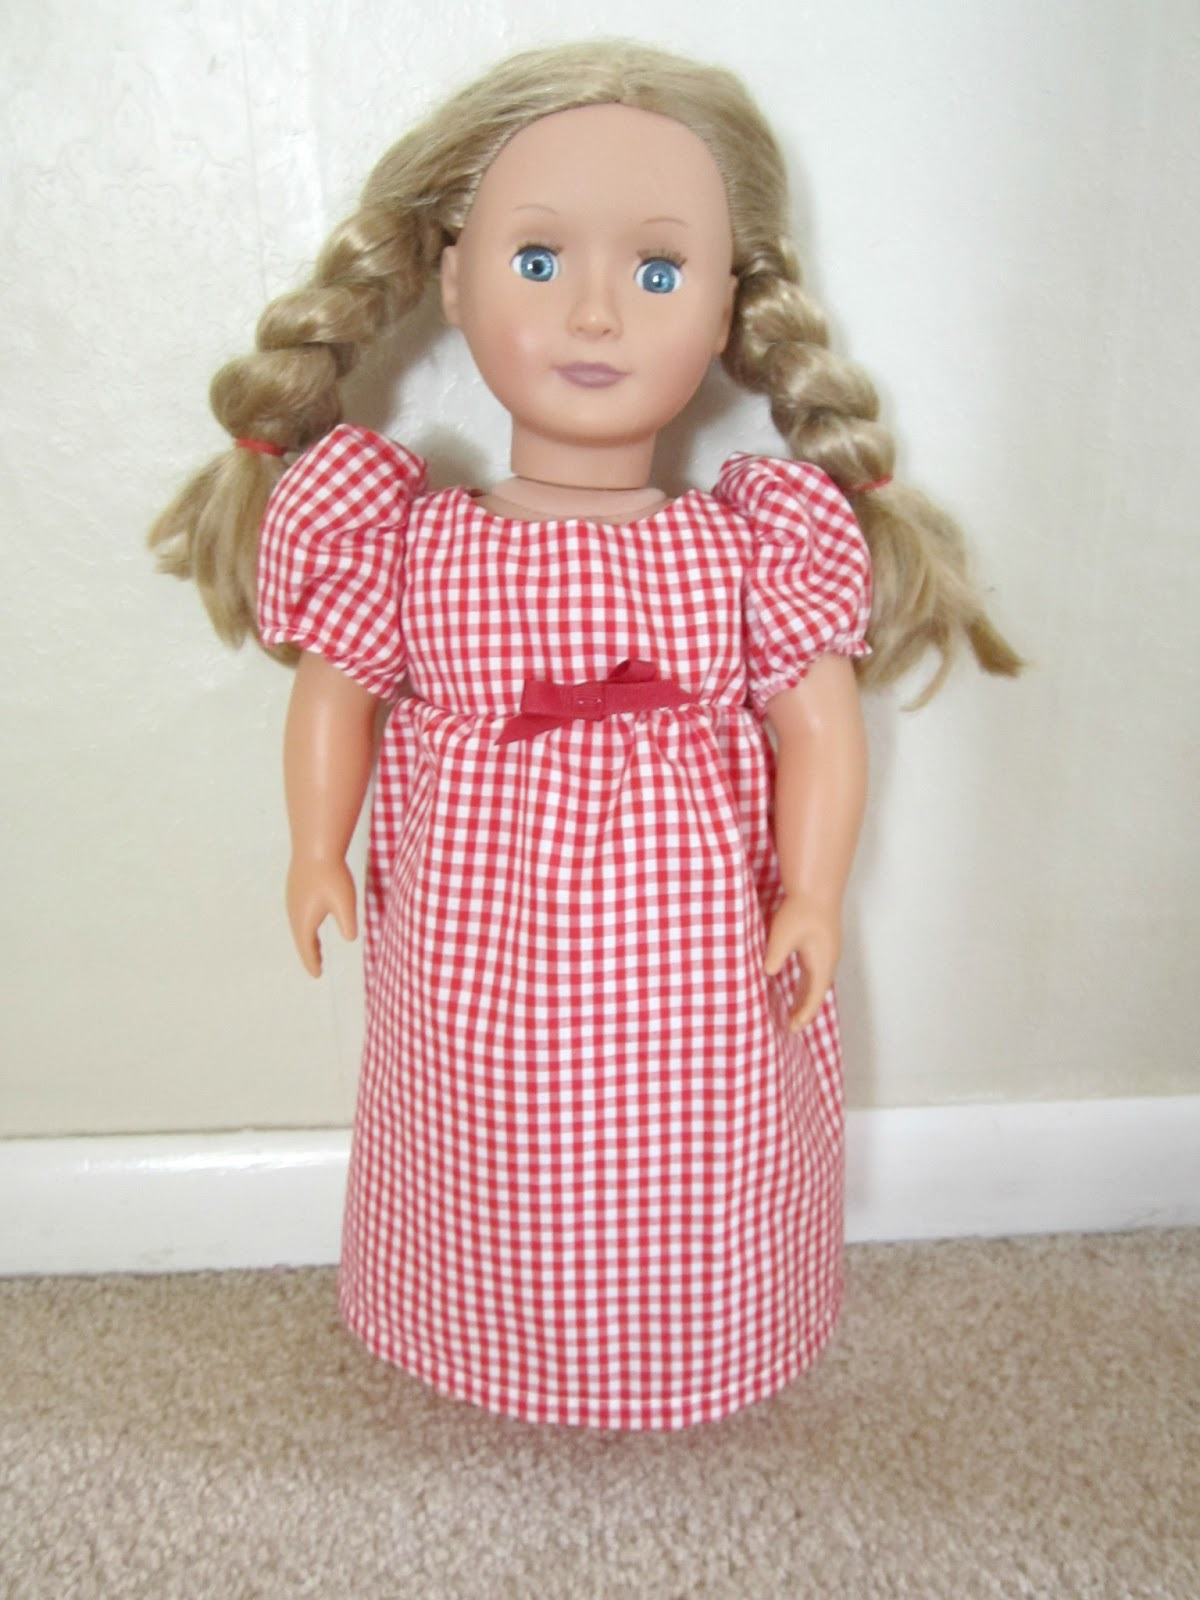 Crafty couple diy american girl doll dress for American girl crafts diy